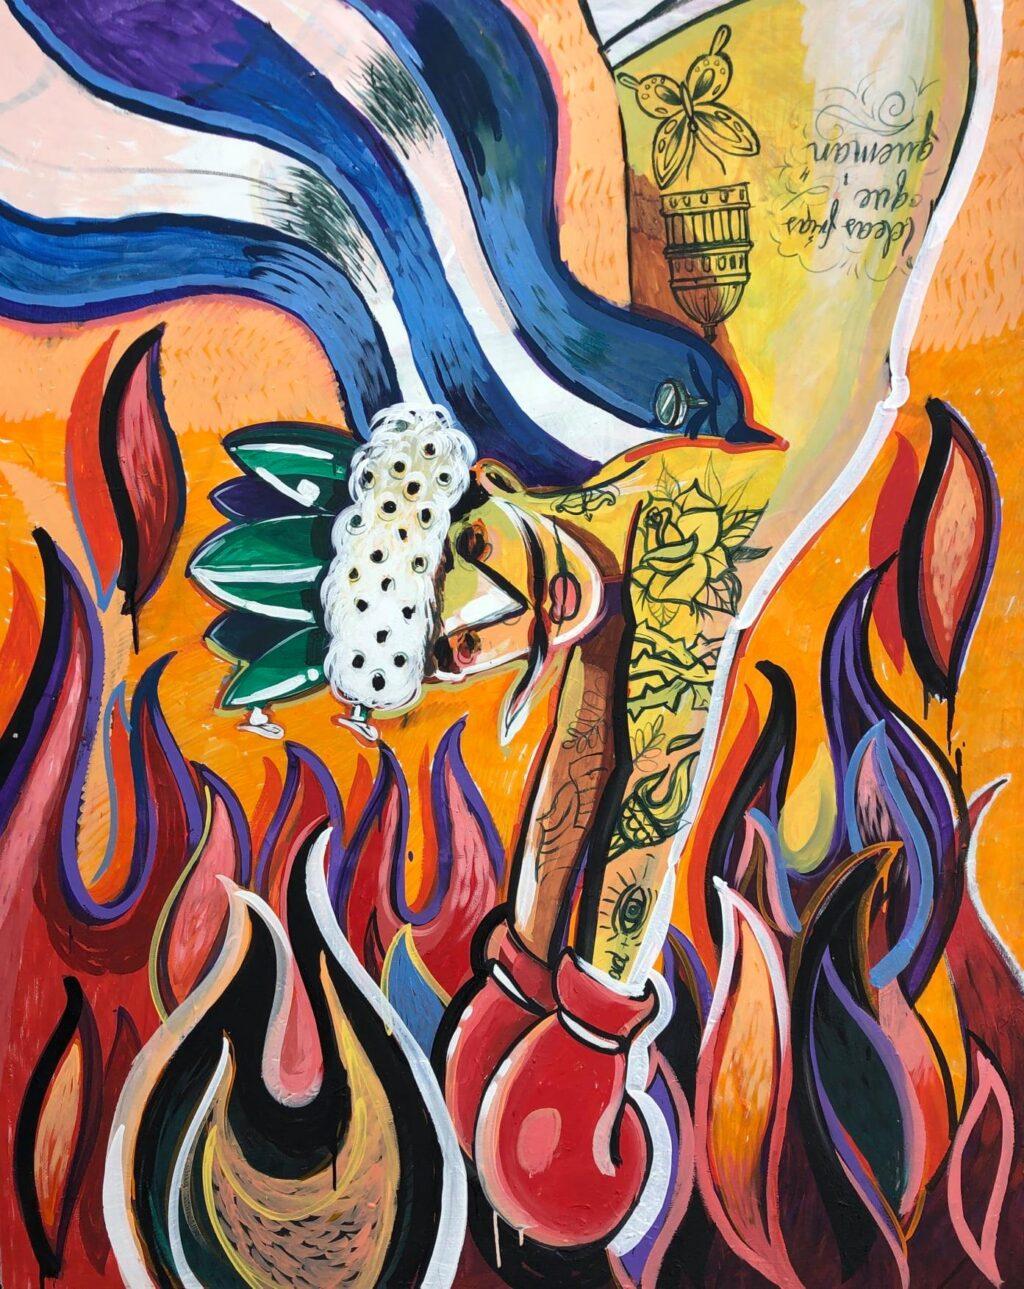 Marco Arturo Herrera - Pa' la caliente 2020, Mixed on canvas, 170 x 140 cm